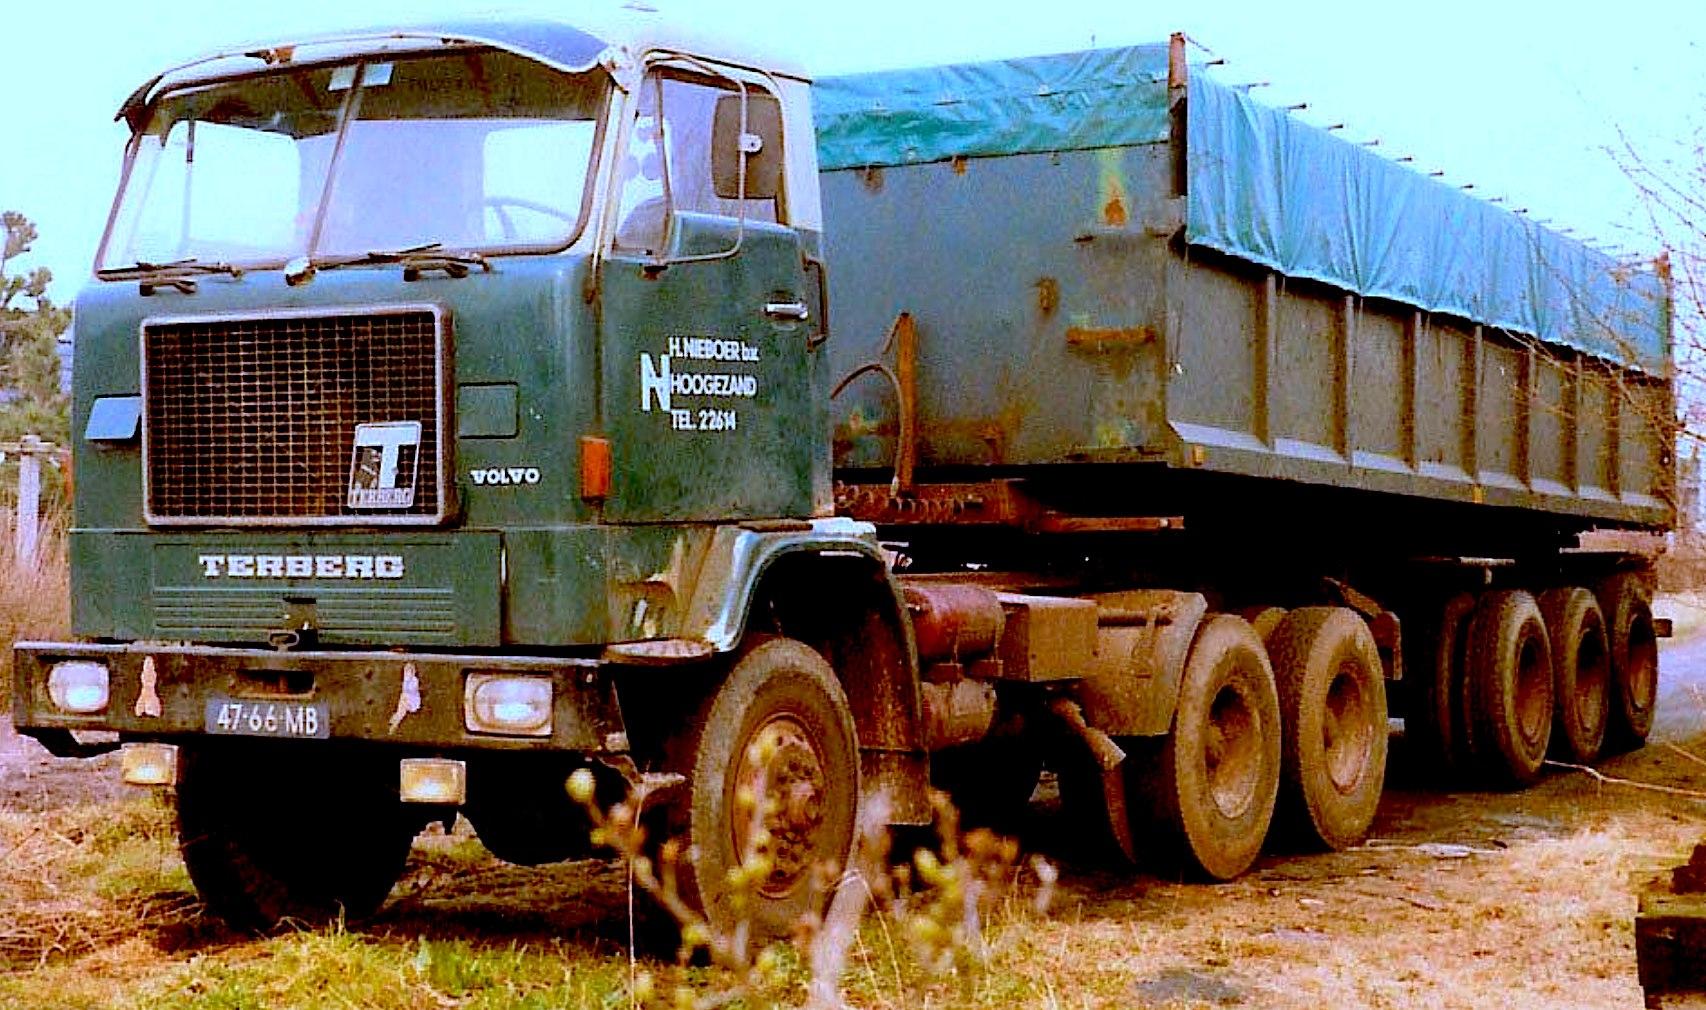 1990s-Terberg-1350-6x6-truck-Netam-trailer